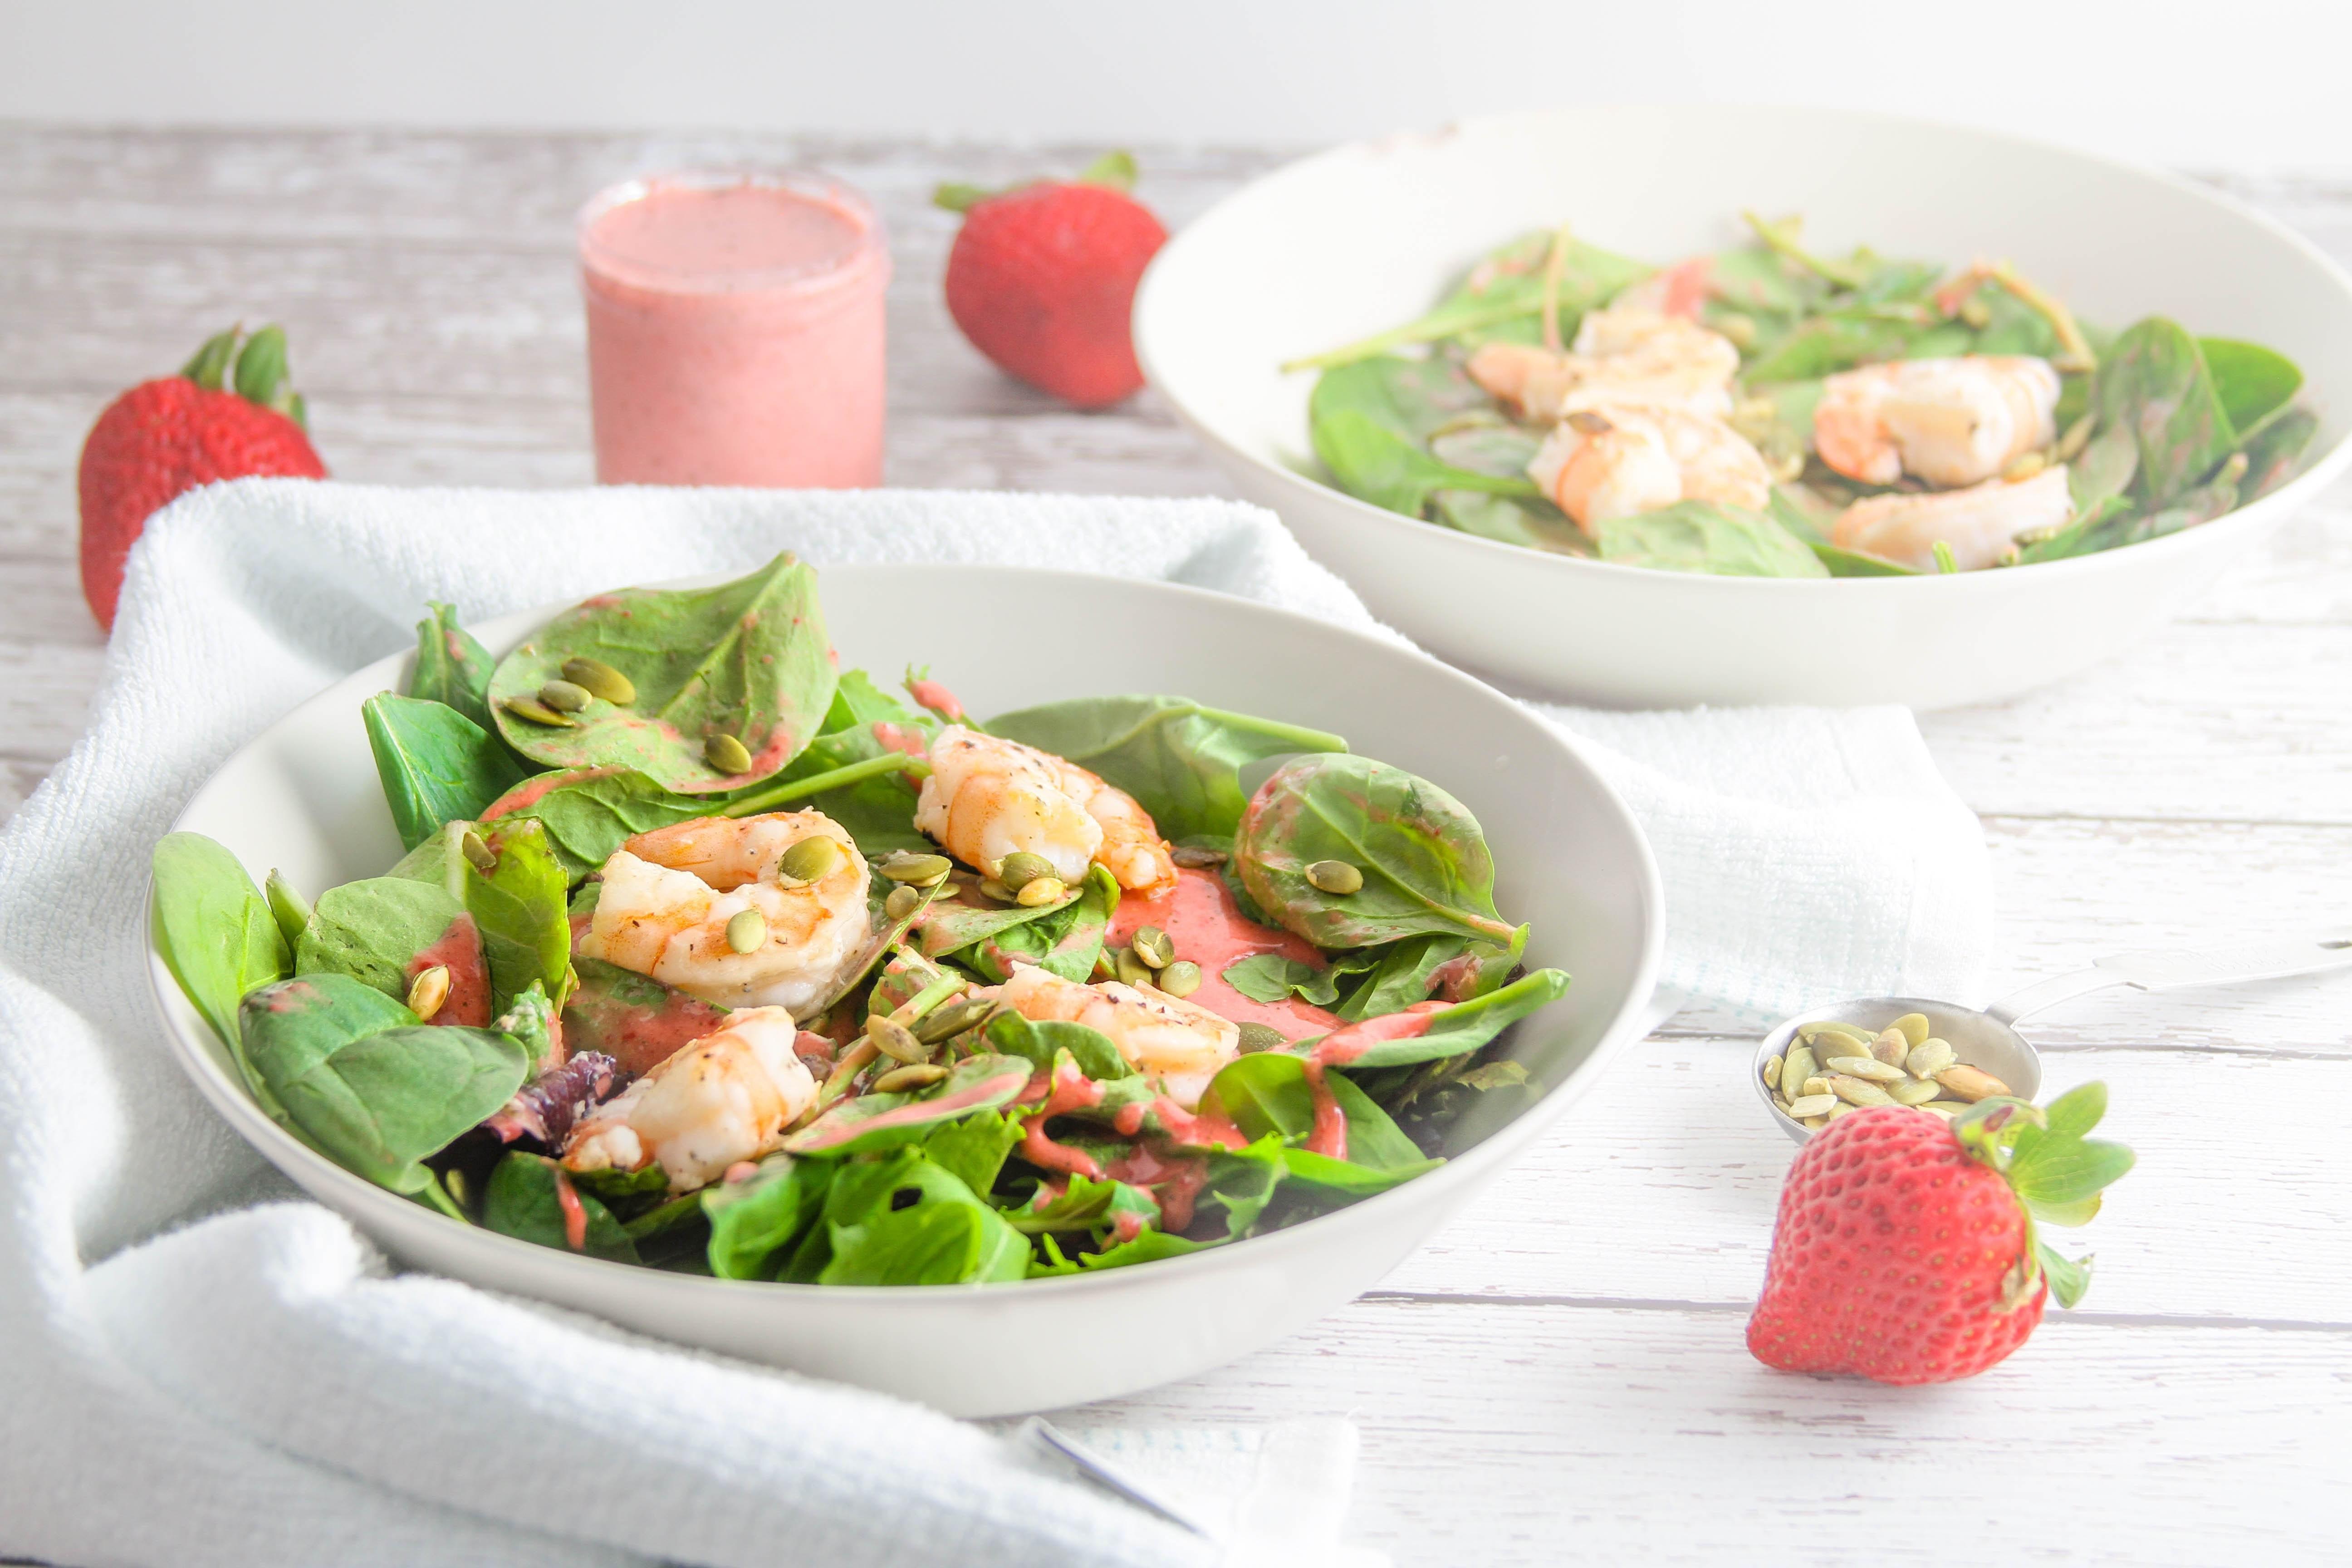 Summer Shrimp Salad  Summer Shrimp Salad With Creamy Strawberry Mint Dressing